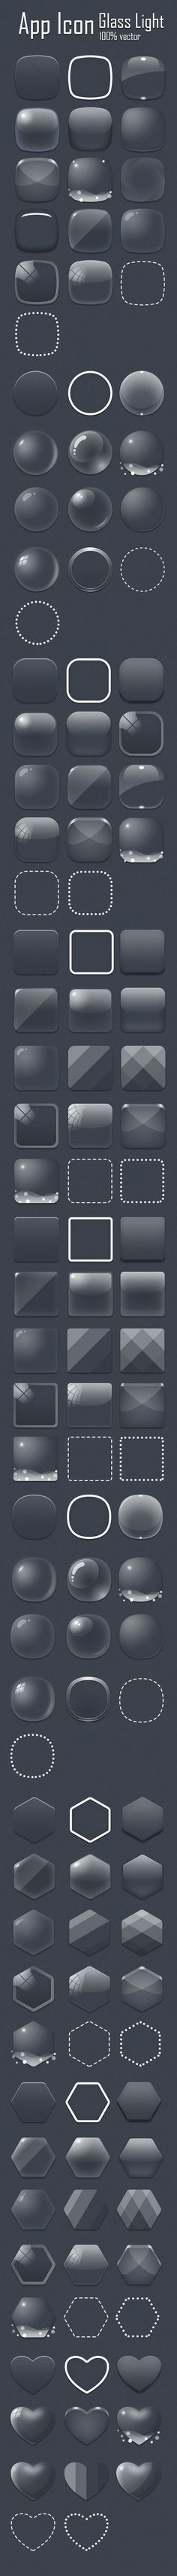 App icon glass light